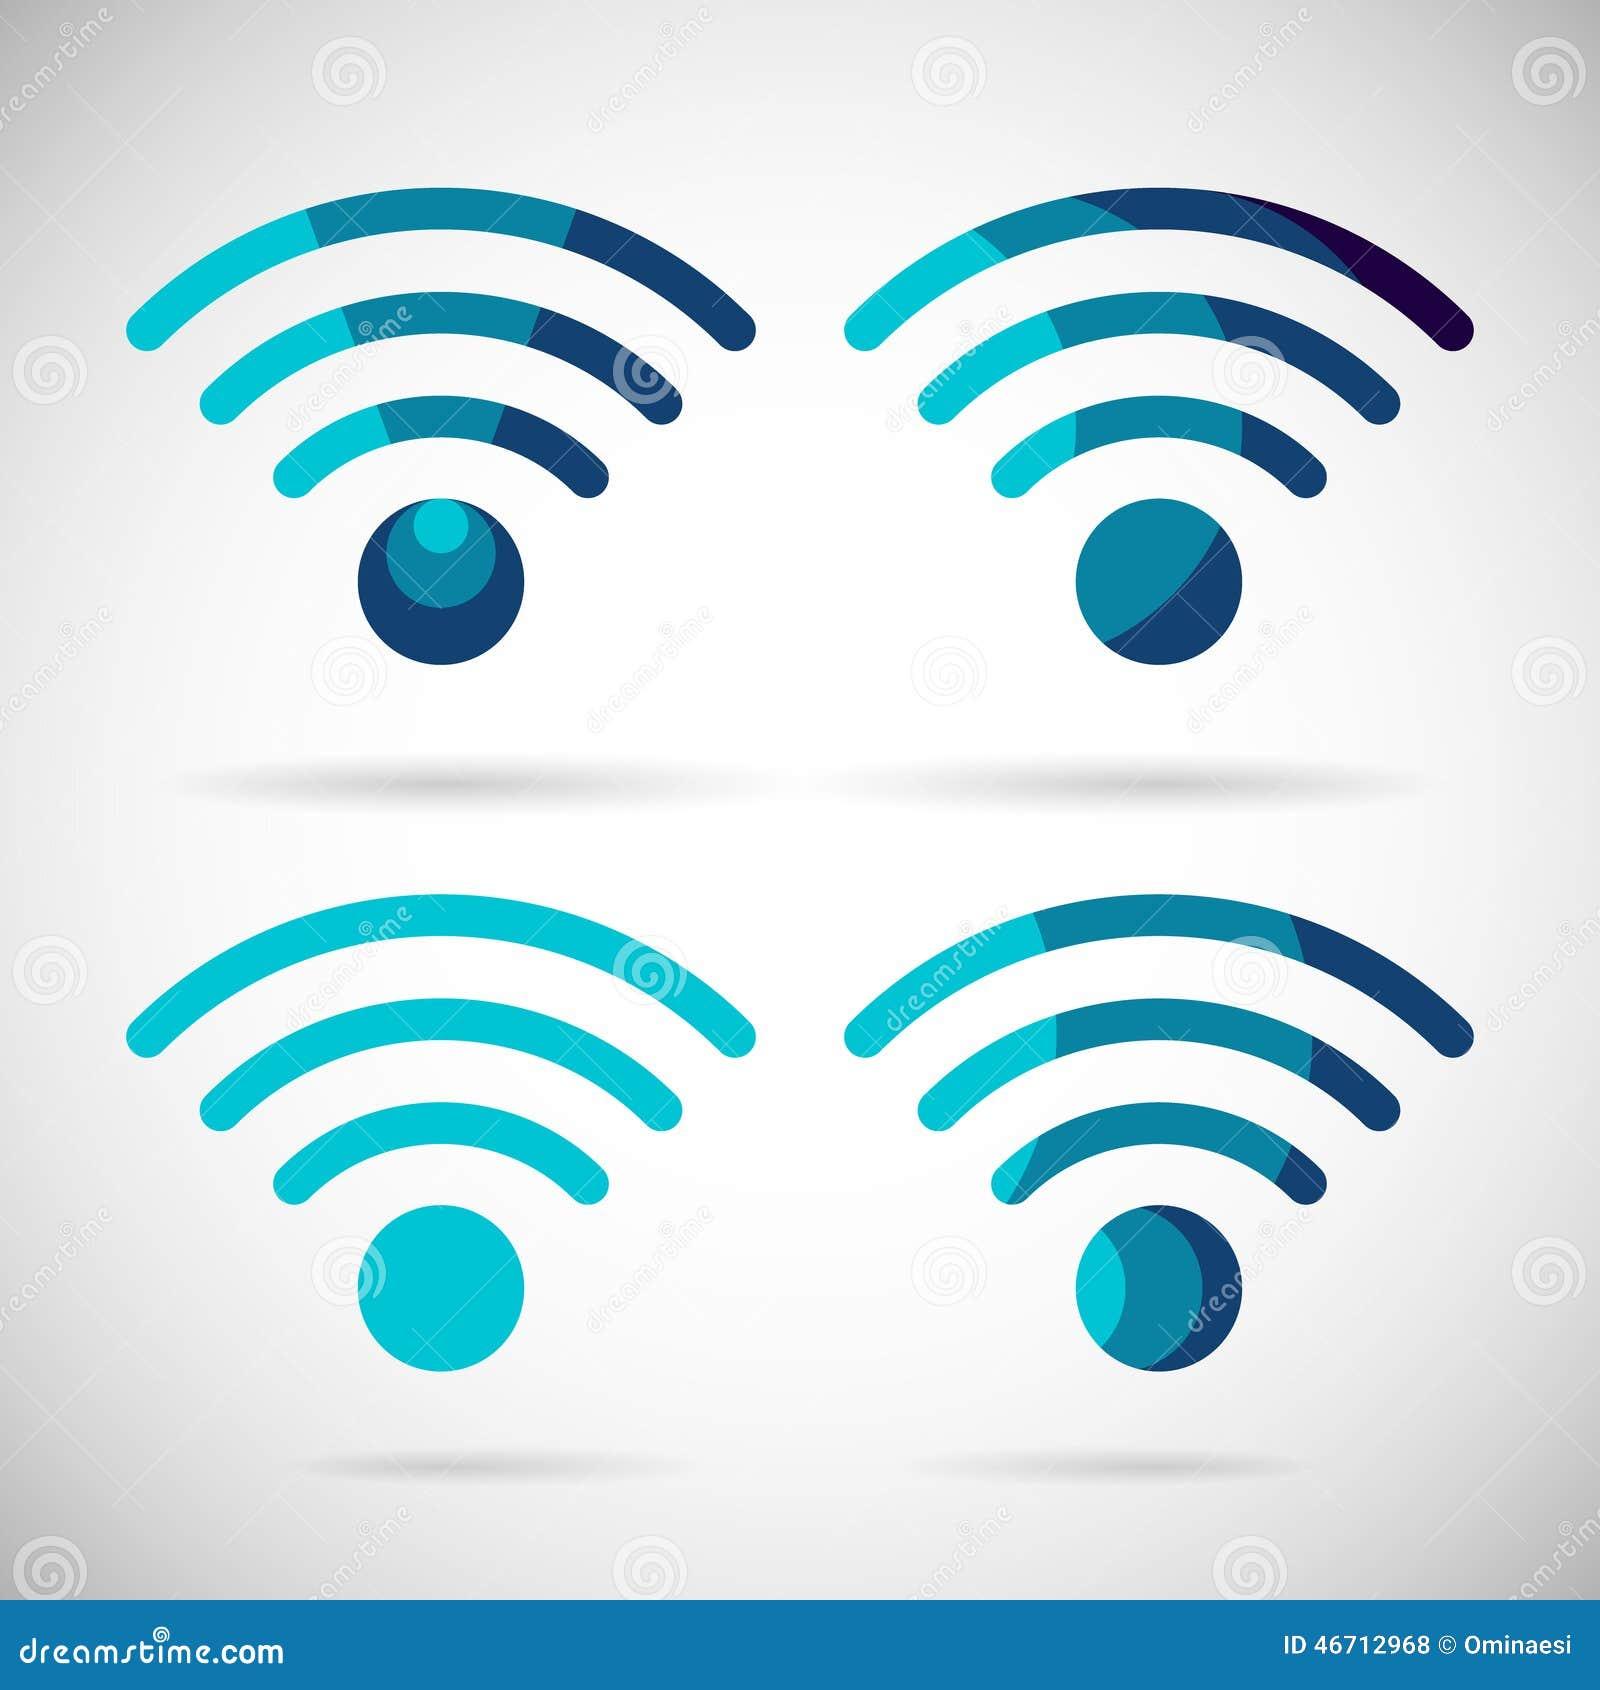 Wifi icon wireless internet connection flat design stock vector wifi icon wireless internet connection flat design buycottarizona Images